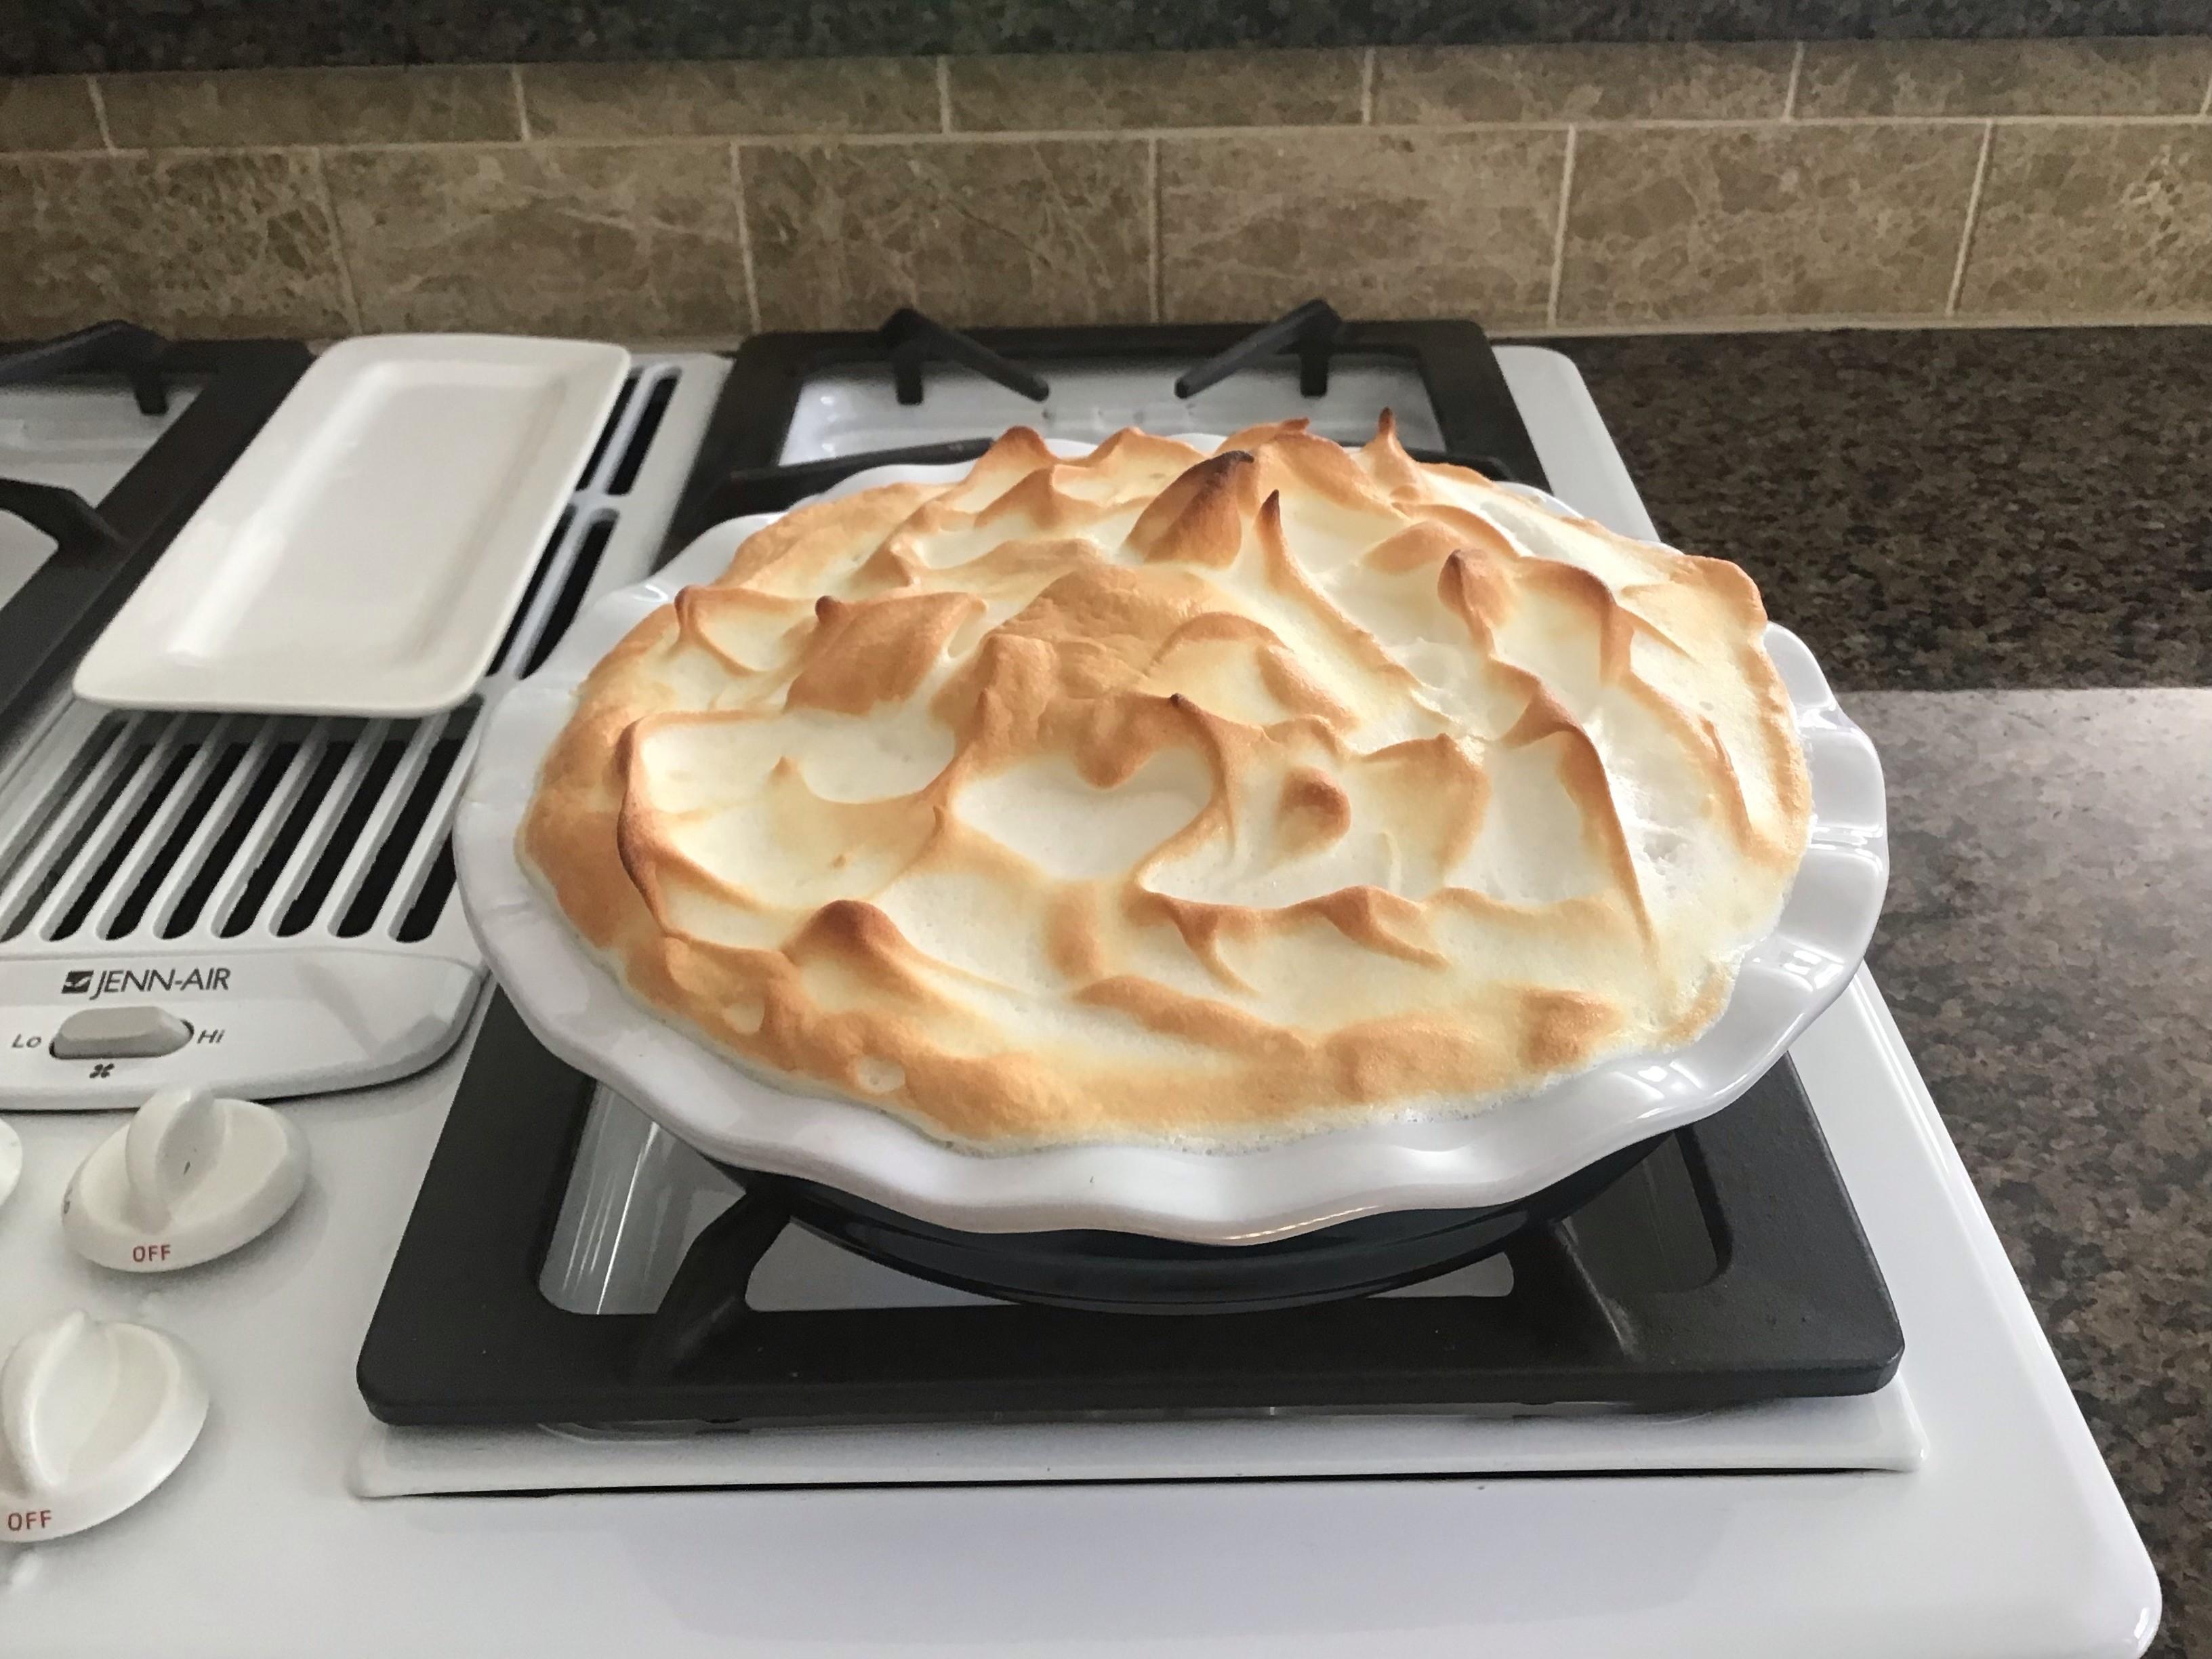 Southern-Style Baked Banana Pudding